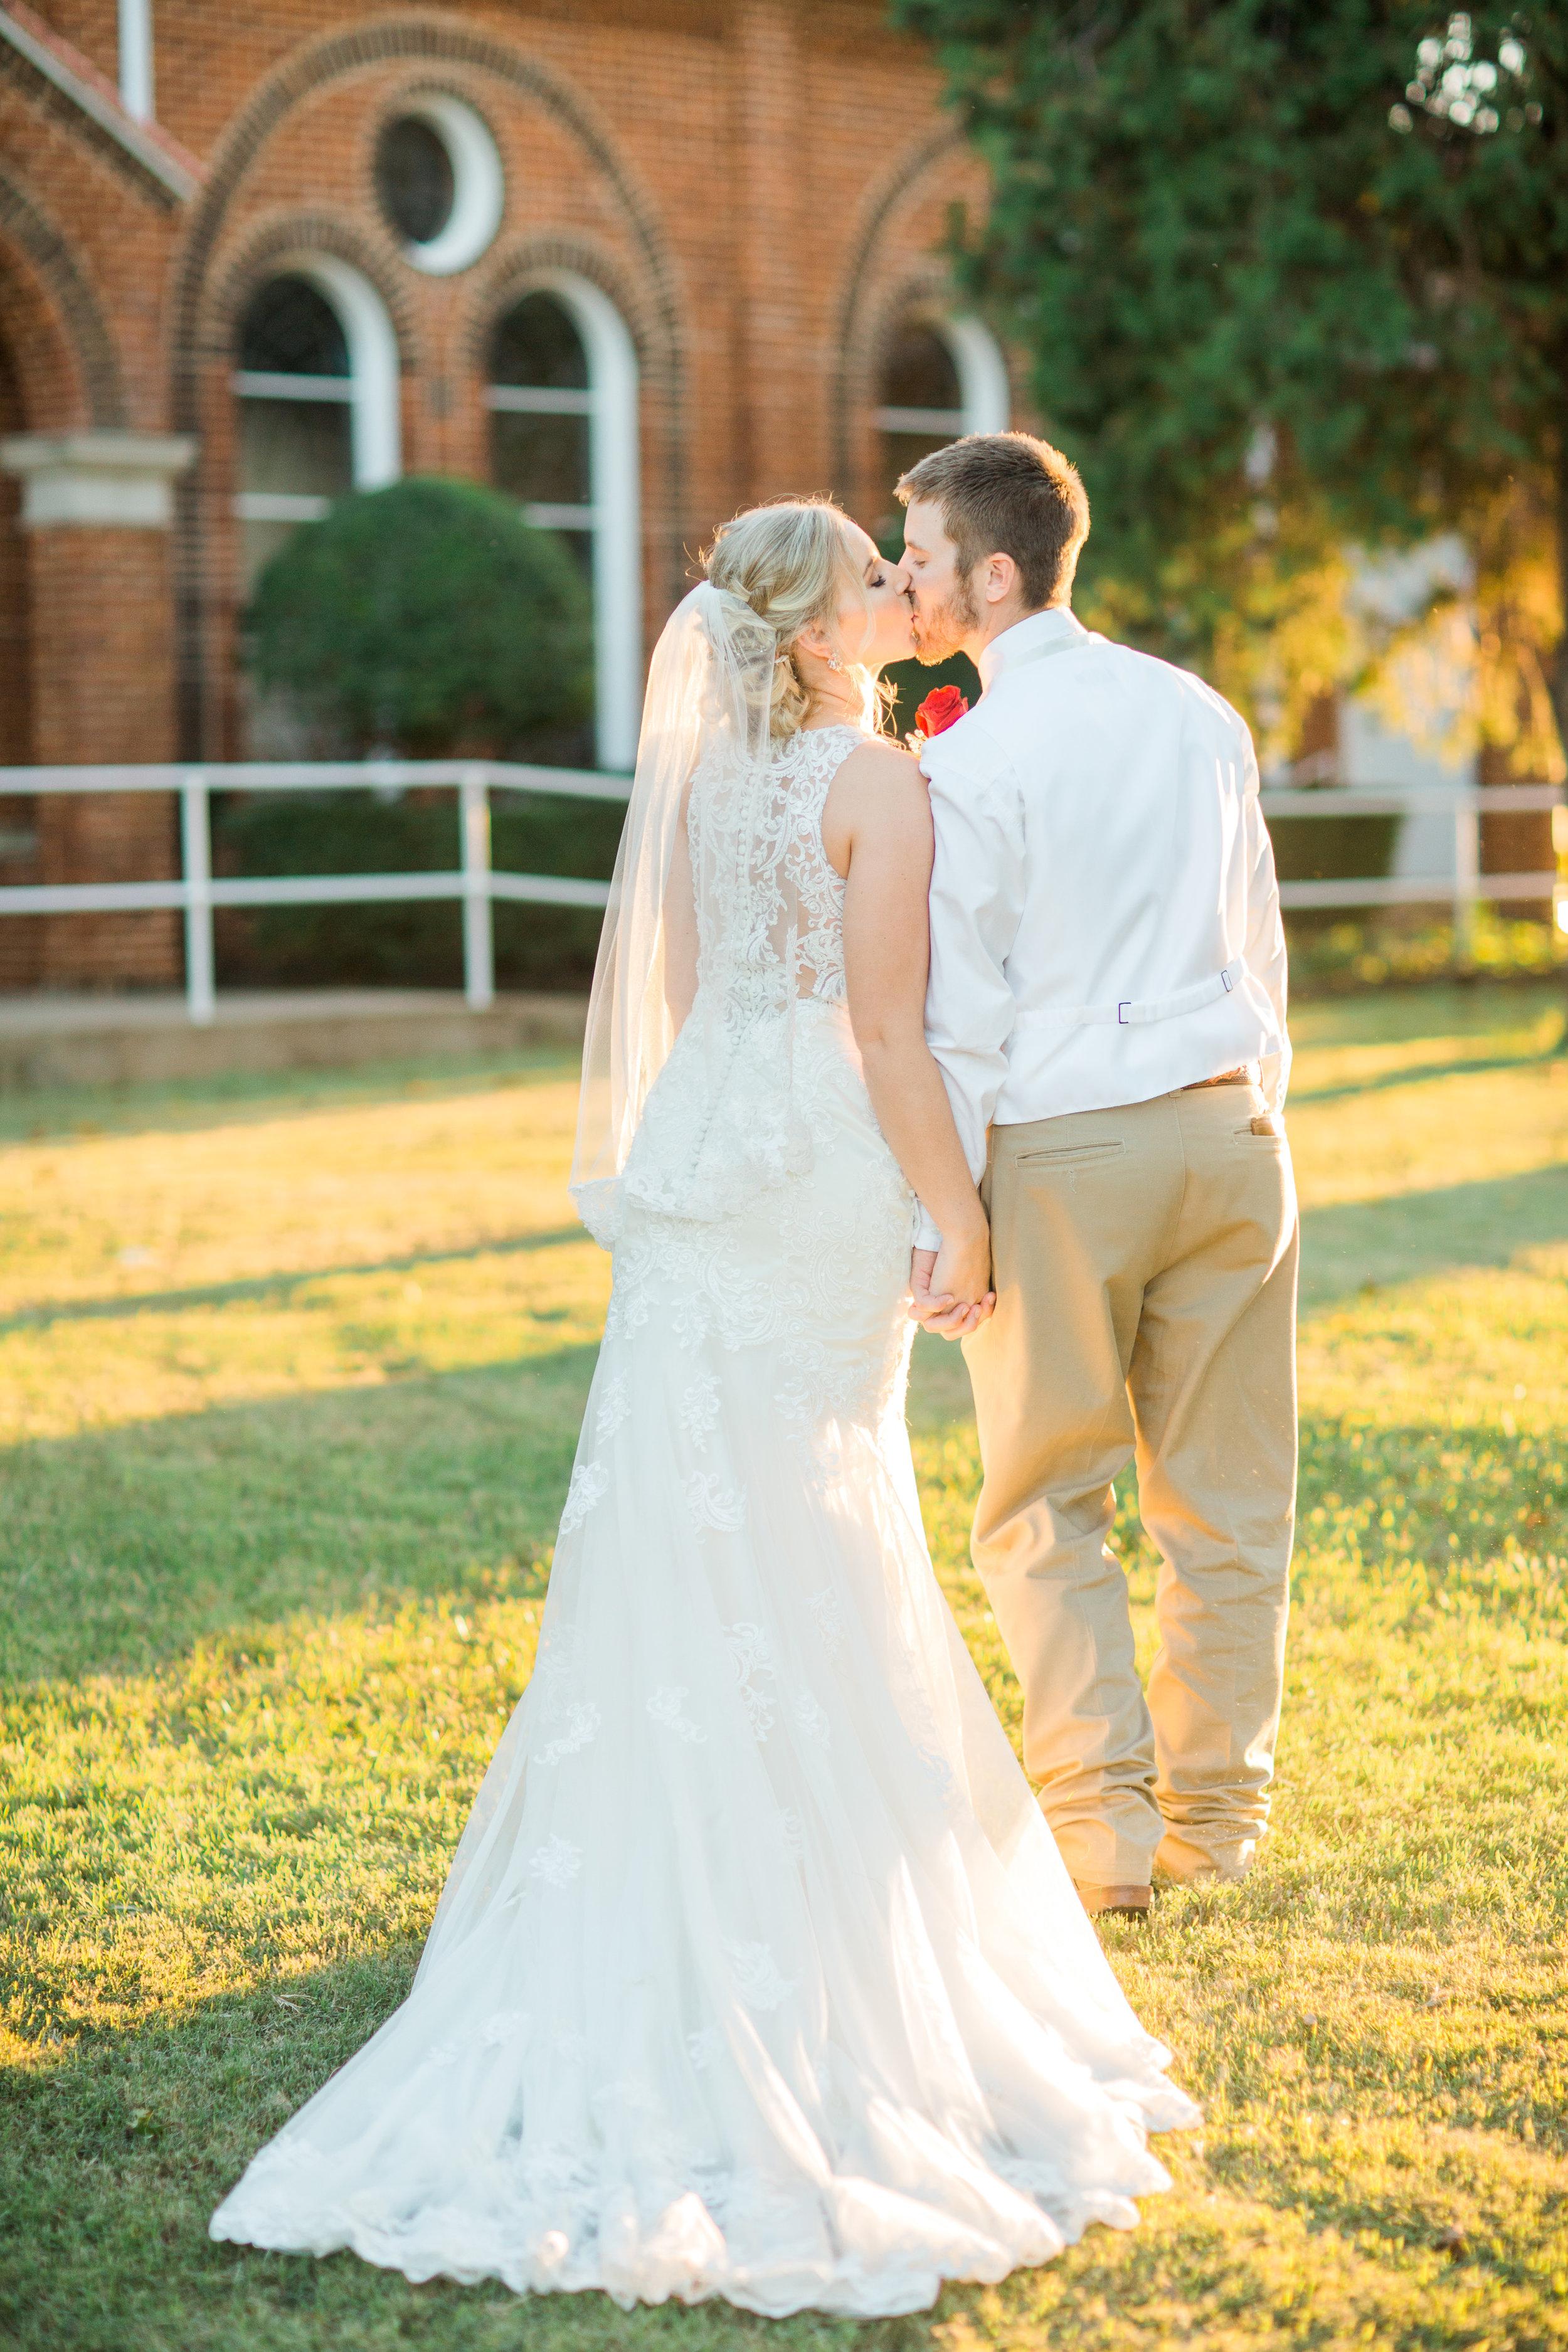 Bailey-Nathan-Windthorst-Texas-Wedding-053.jpg